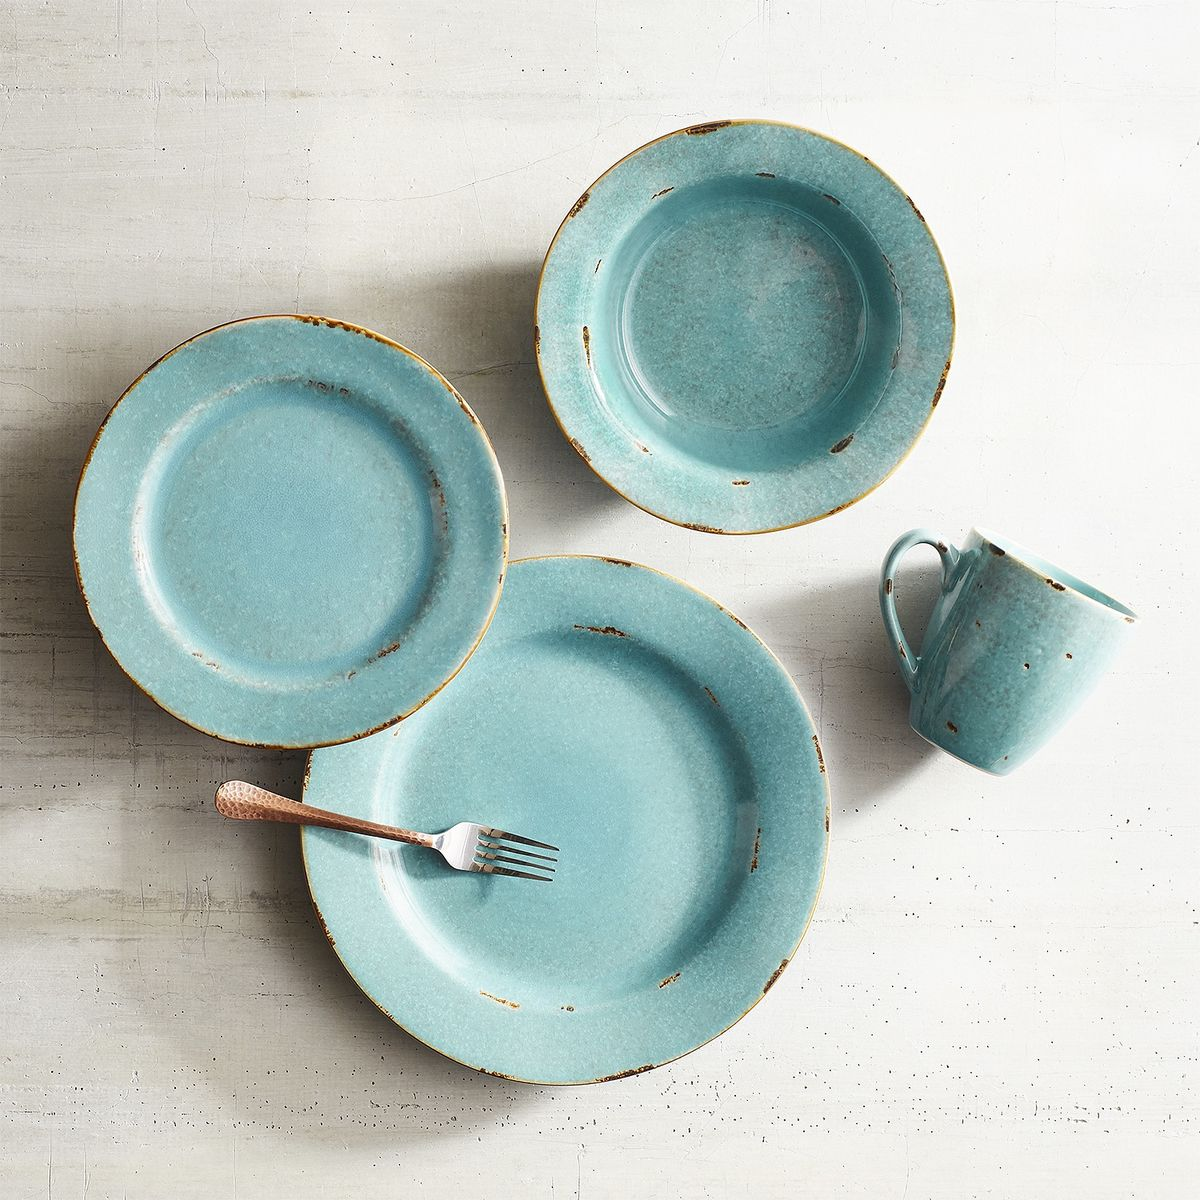 Hacienda de Vida Turquoise Dinnerware